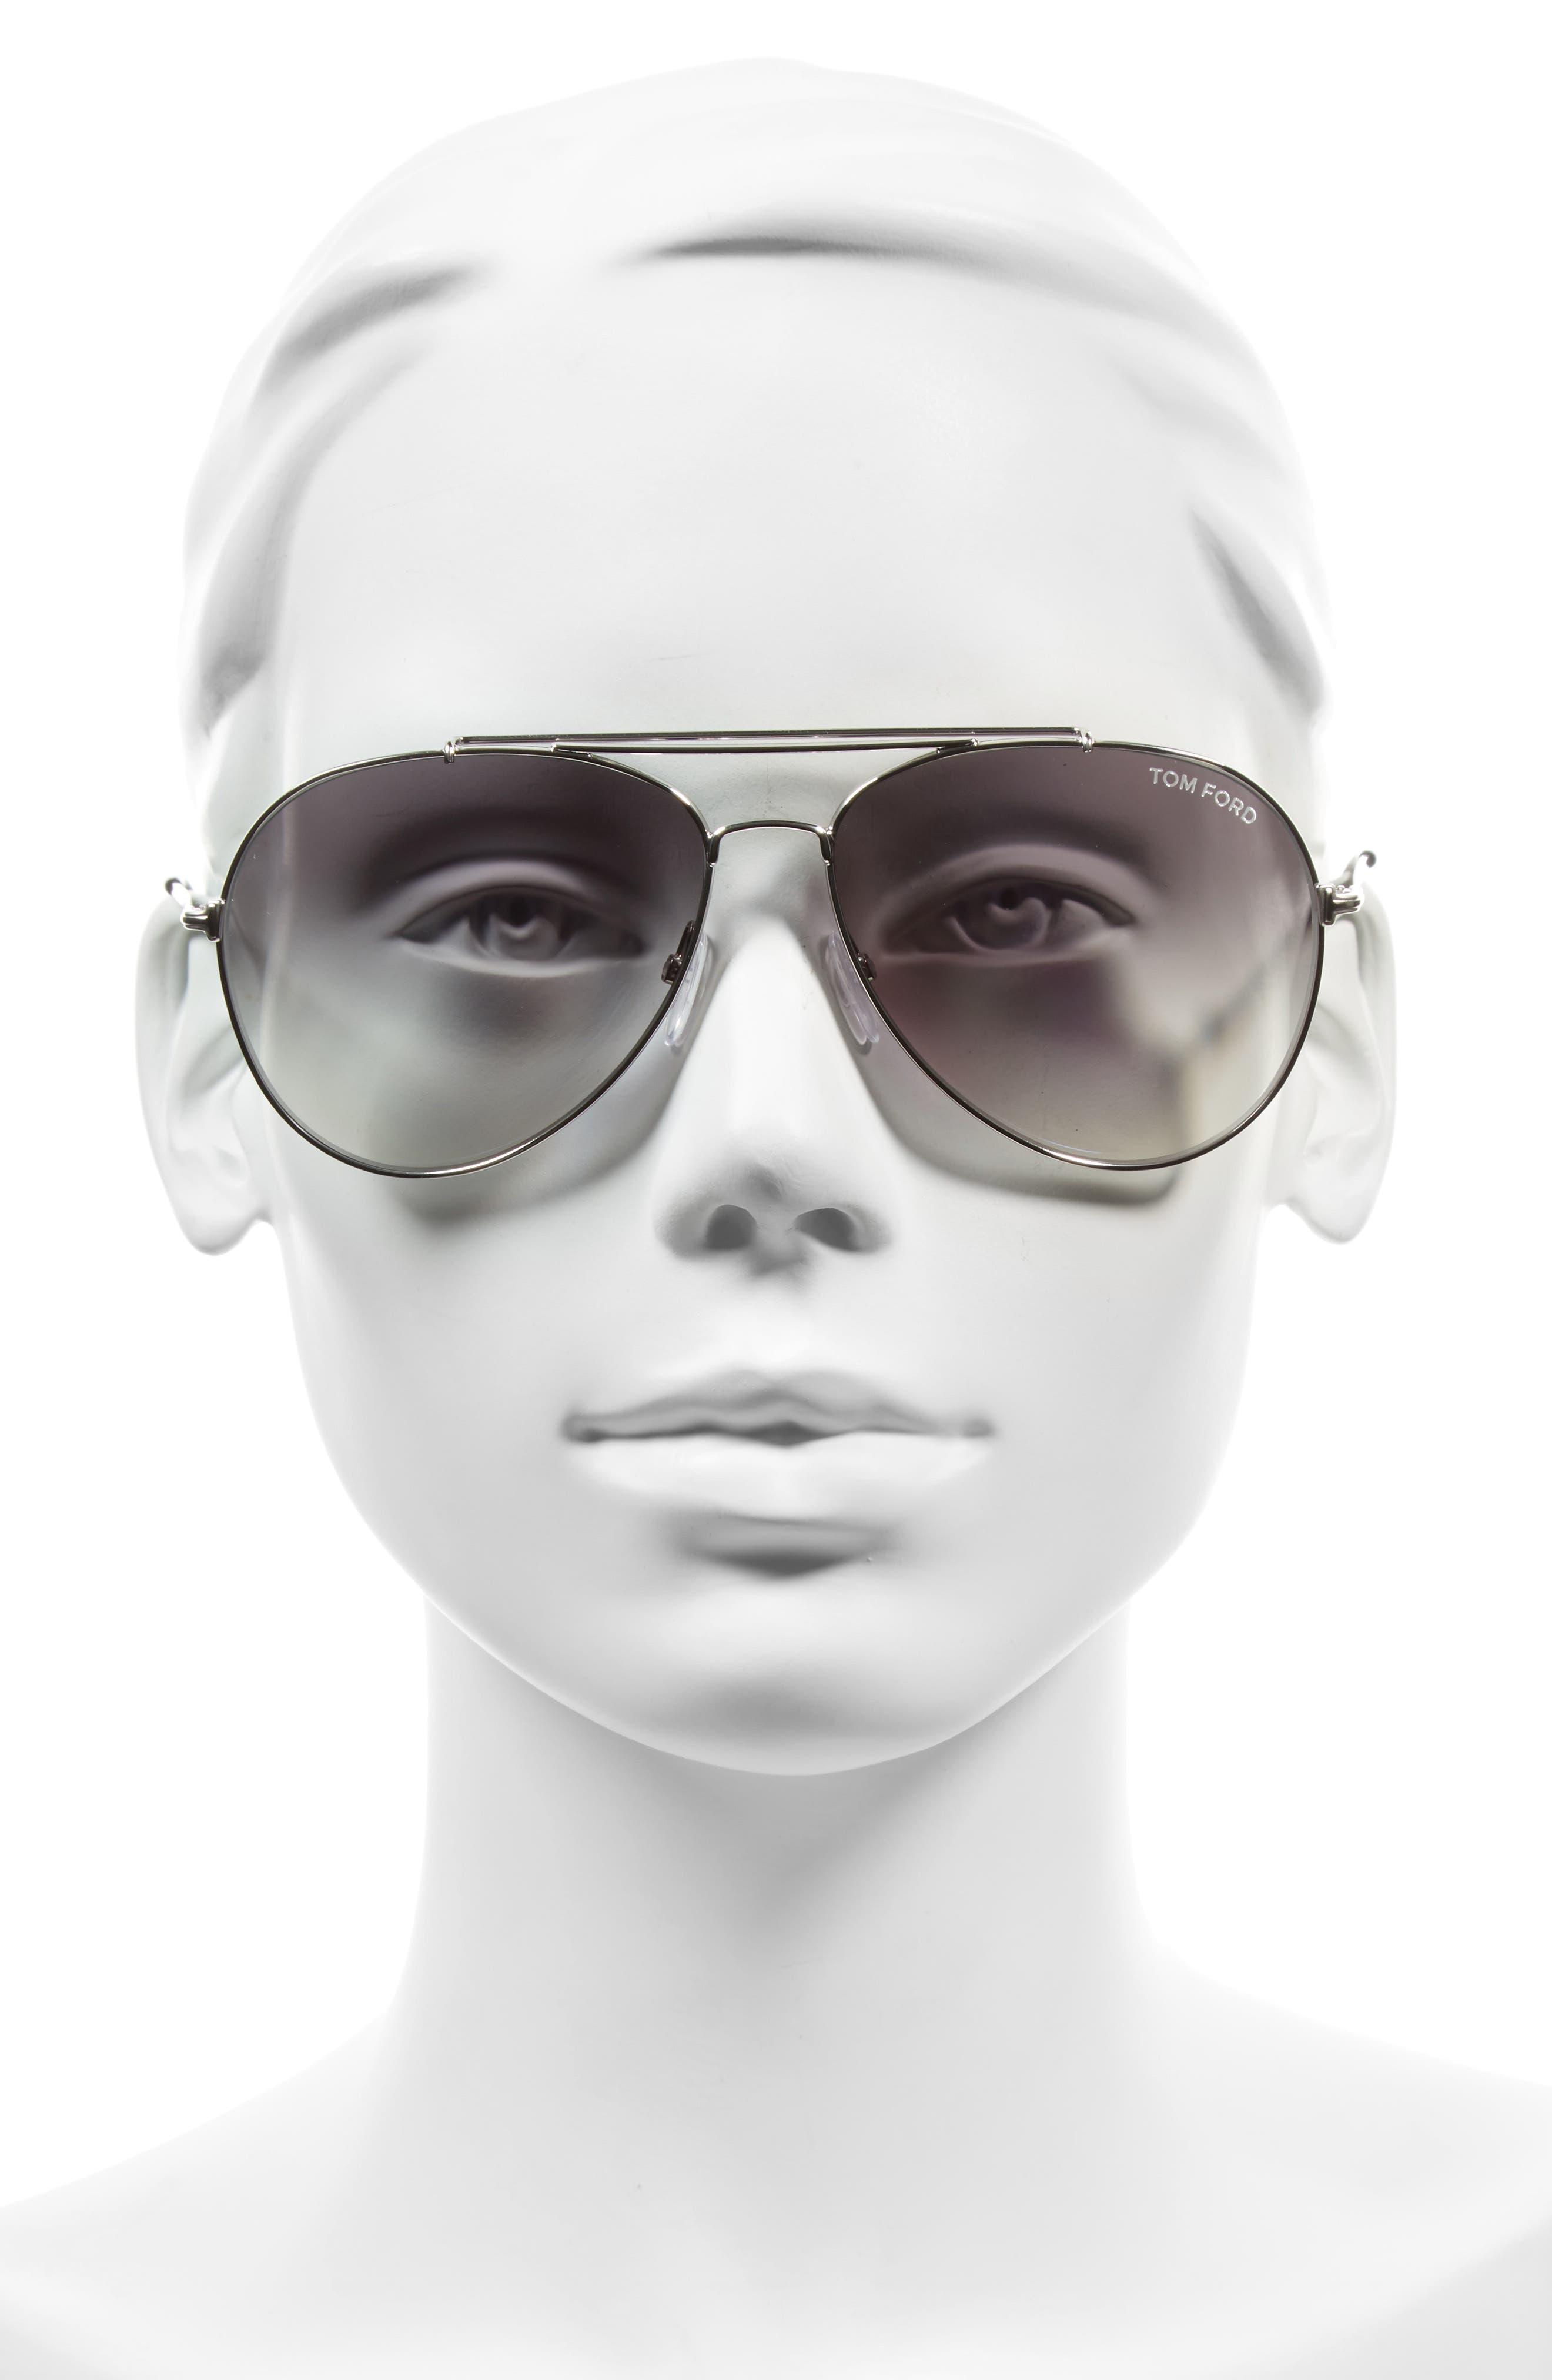 Indiana 60mm Aviator Sunglasses,                             Alternate thumbnail 2, color,                             Rhodium/ Black/ Gradient Smoke